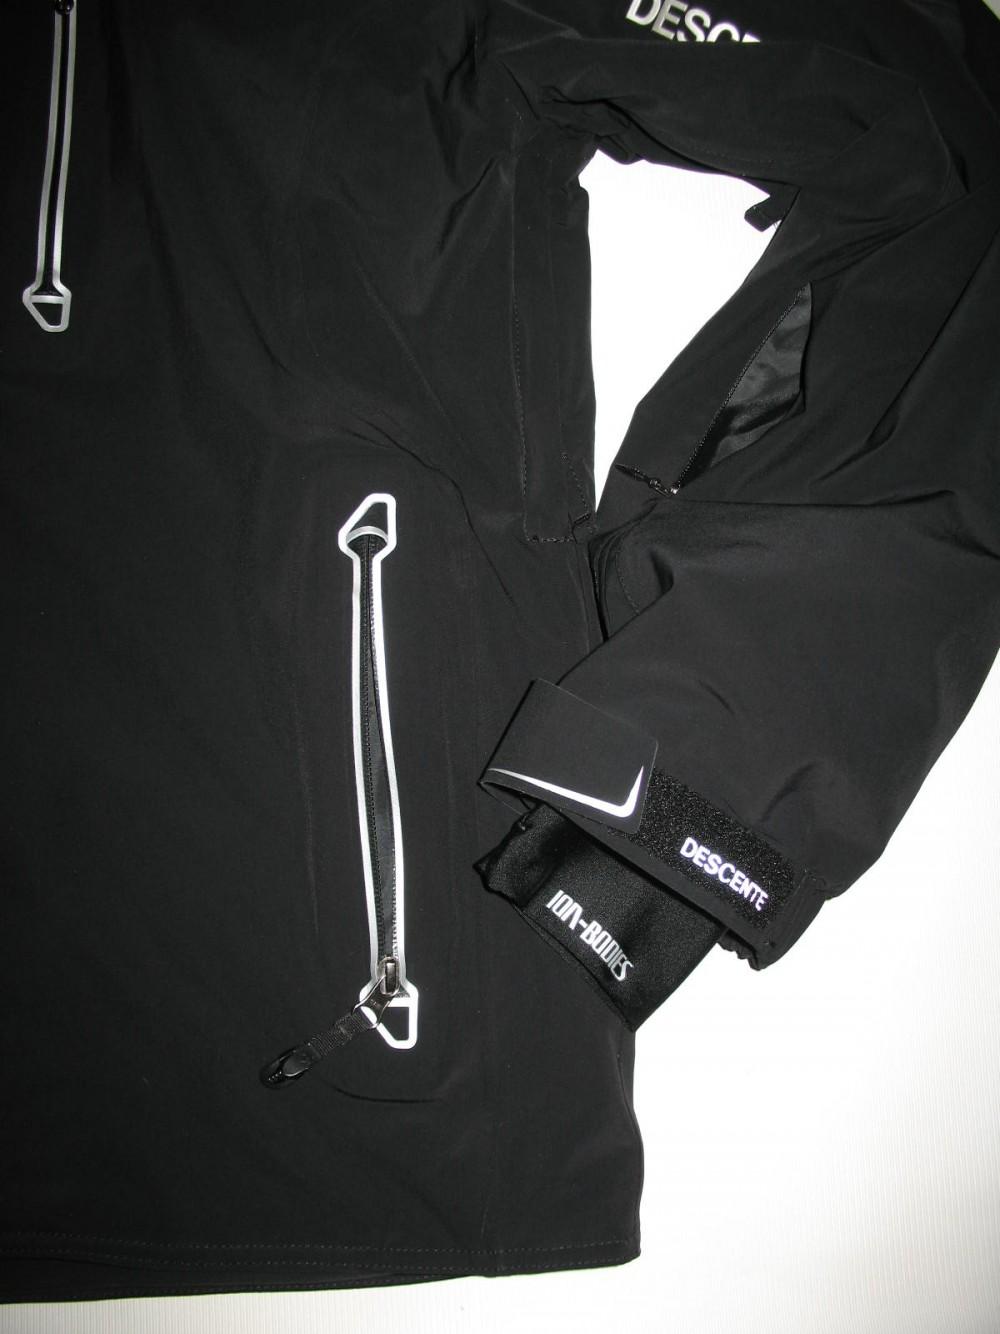 Куртка DESCENTE swiss olympic ski jacket (размер 54/XL) - 6